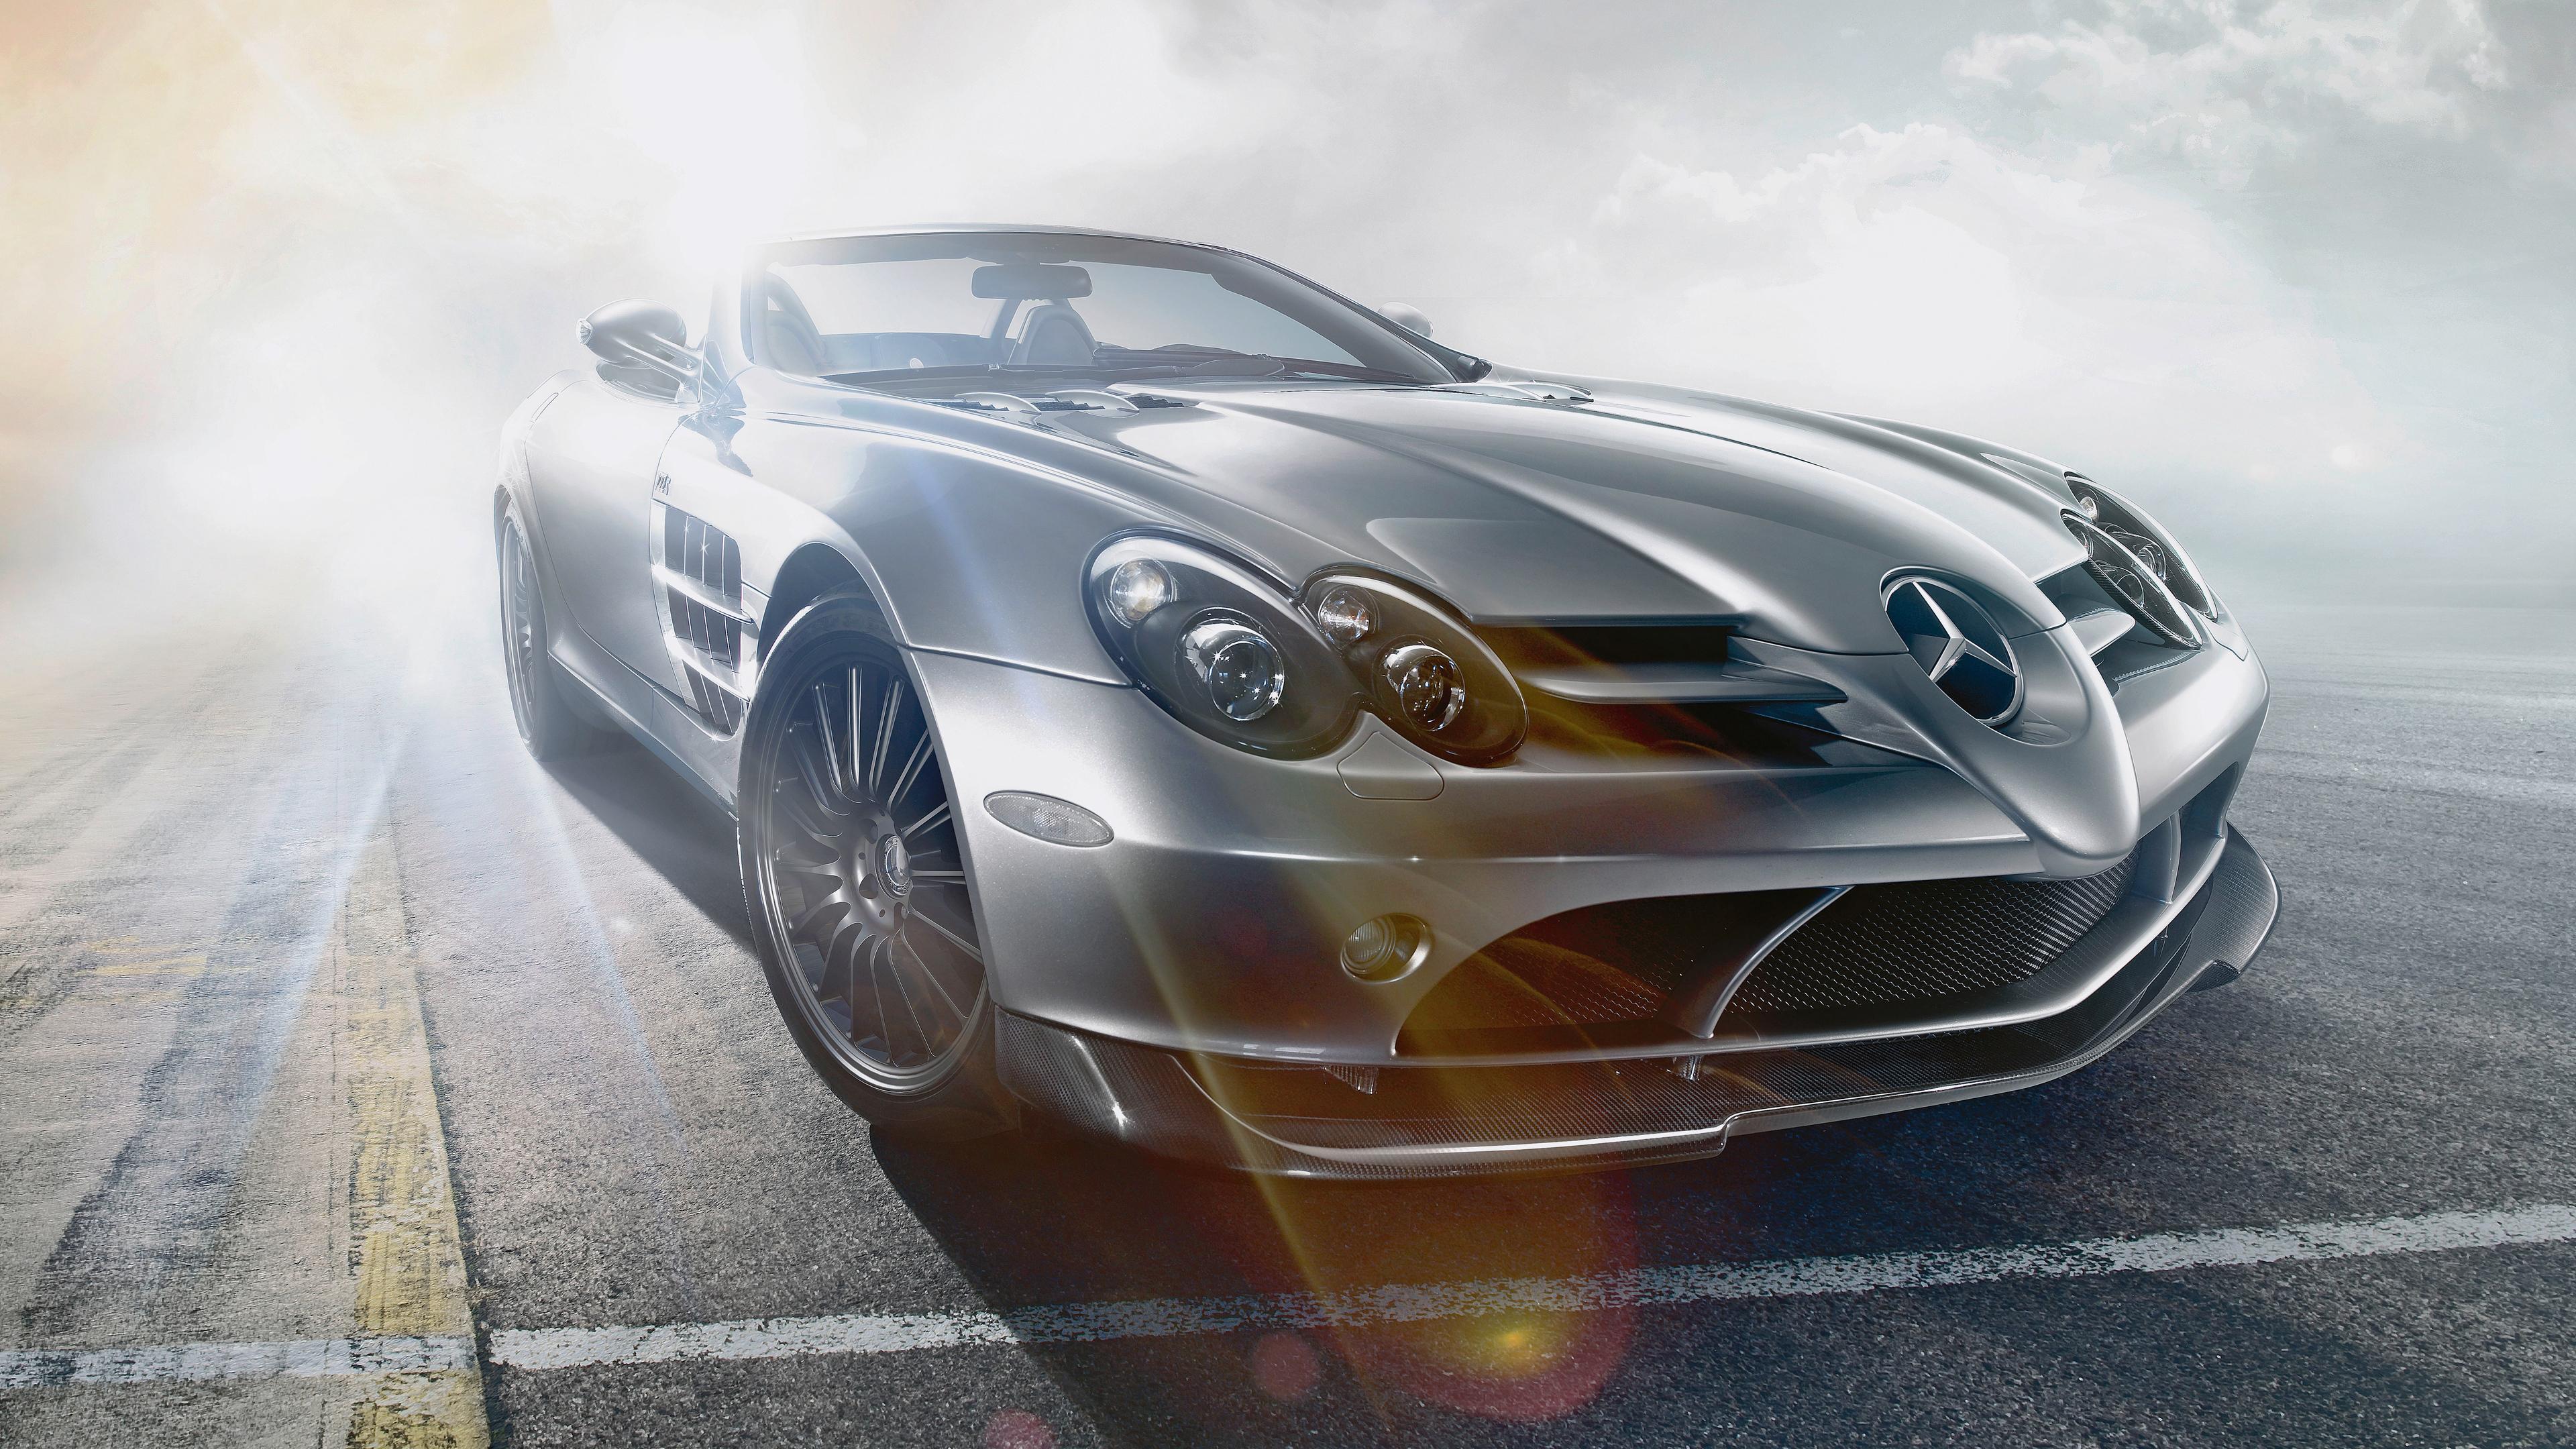 mercedes benz slr mclaren roadster 4k 1554245337 - Mercedes Benz SLR McLaren Roadster 4k - mercedes benz wallpapers, hd-wallpapers, cars wallpapers, 8k wallpapers, 5k wallpapers, 4k-wallpapers